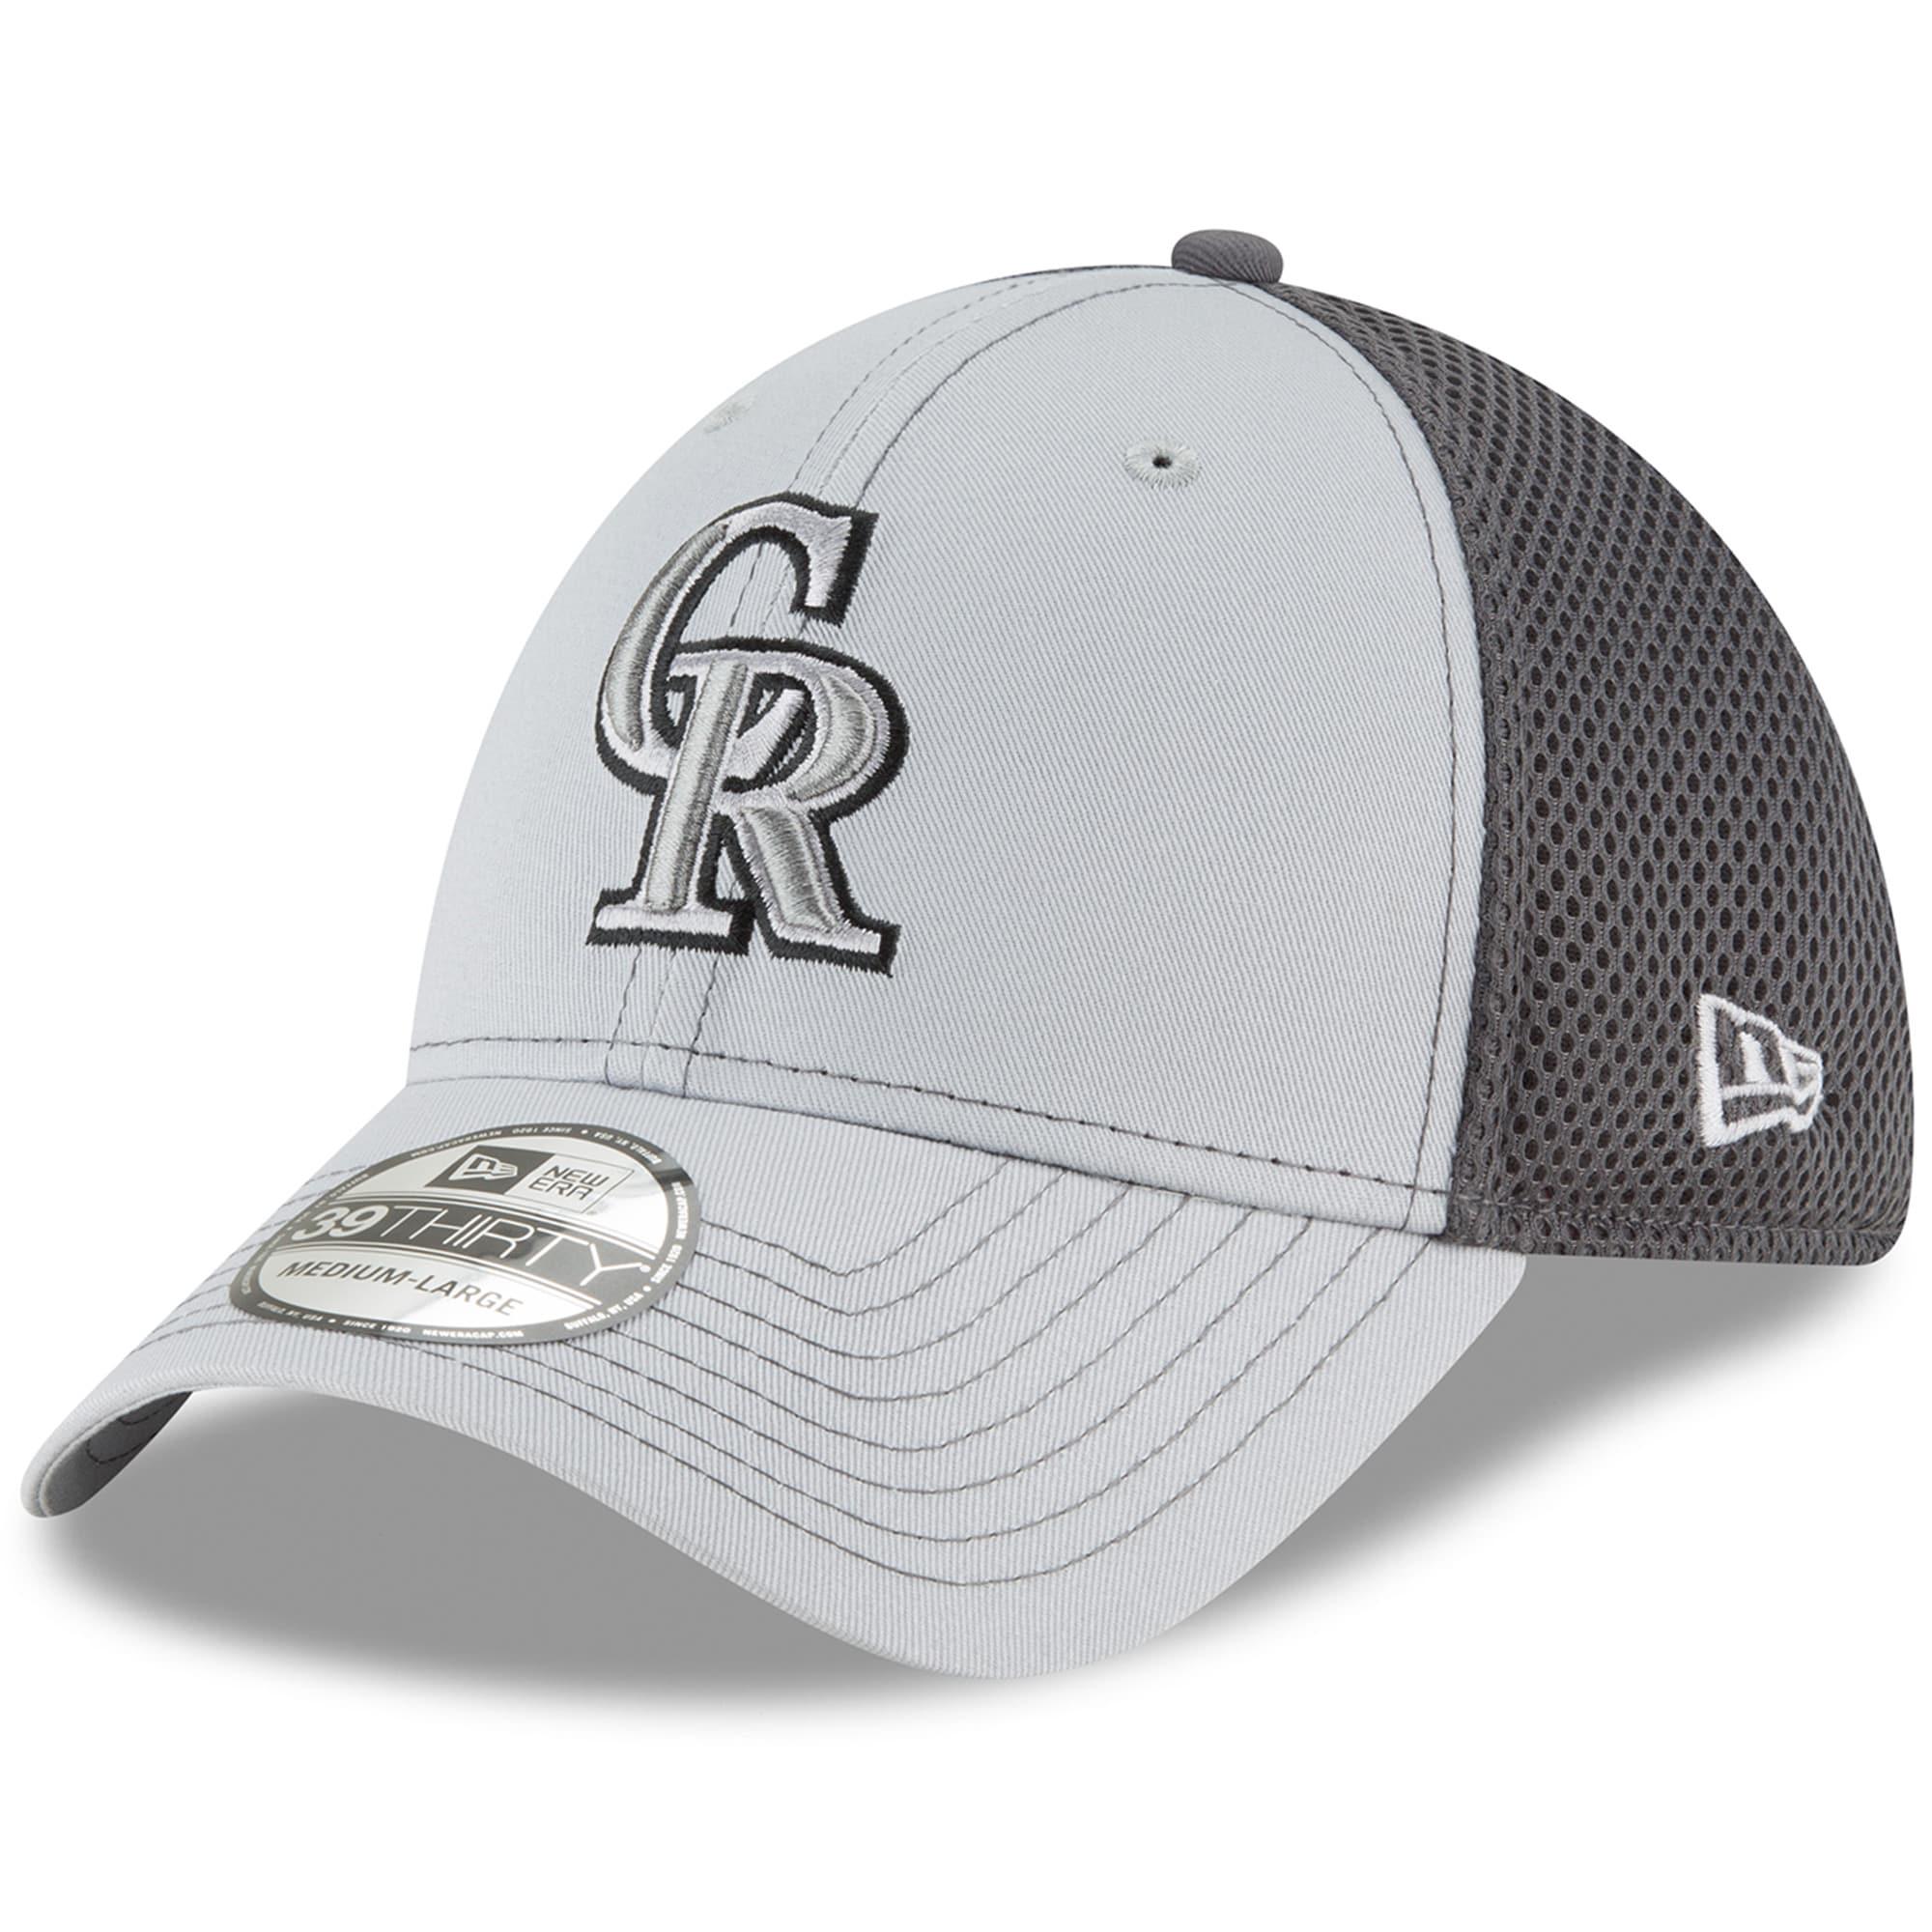 Colorado Rockies New Era Grayed Out Neo 39THIRTY Flex Hat - Gray